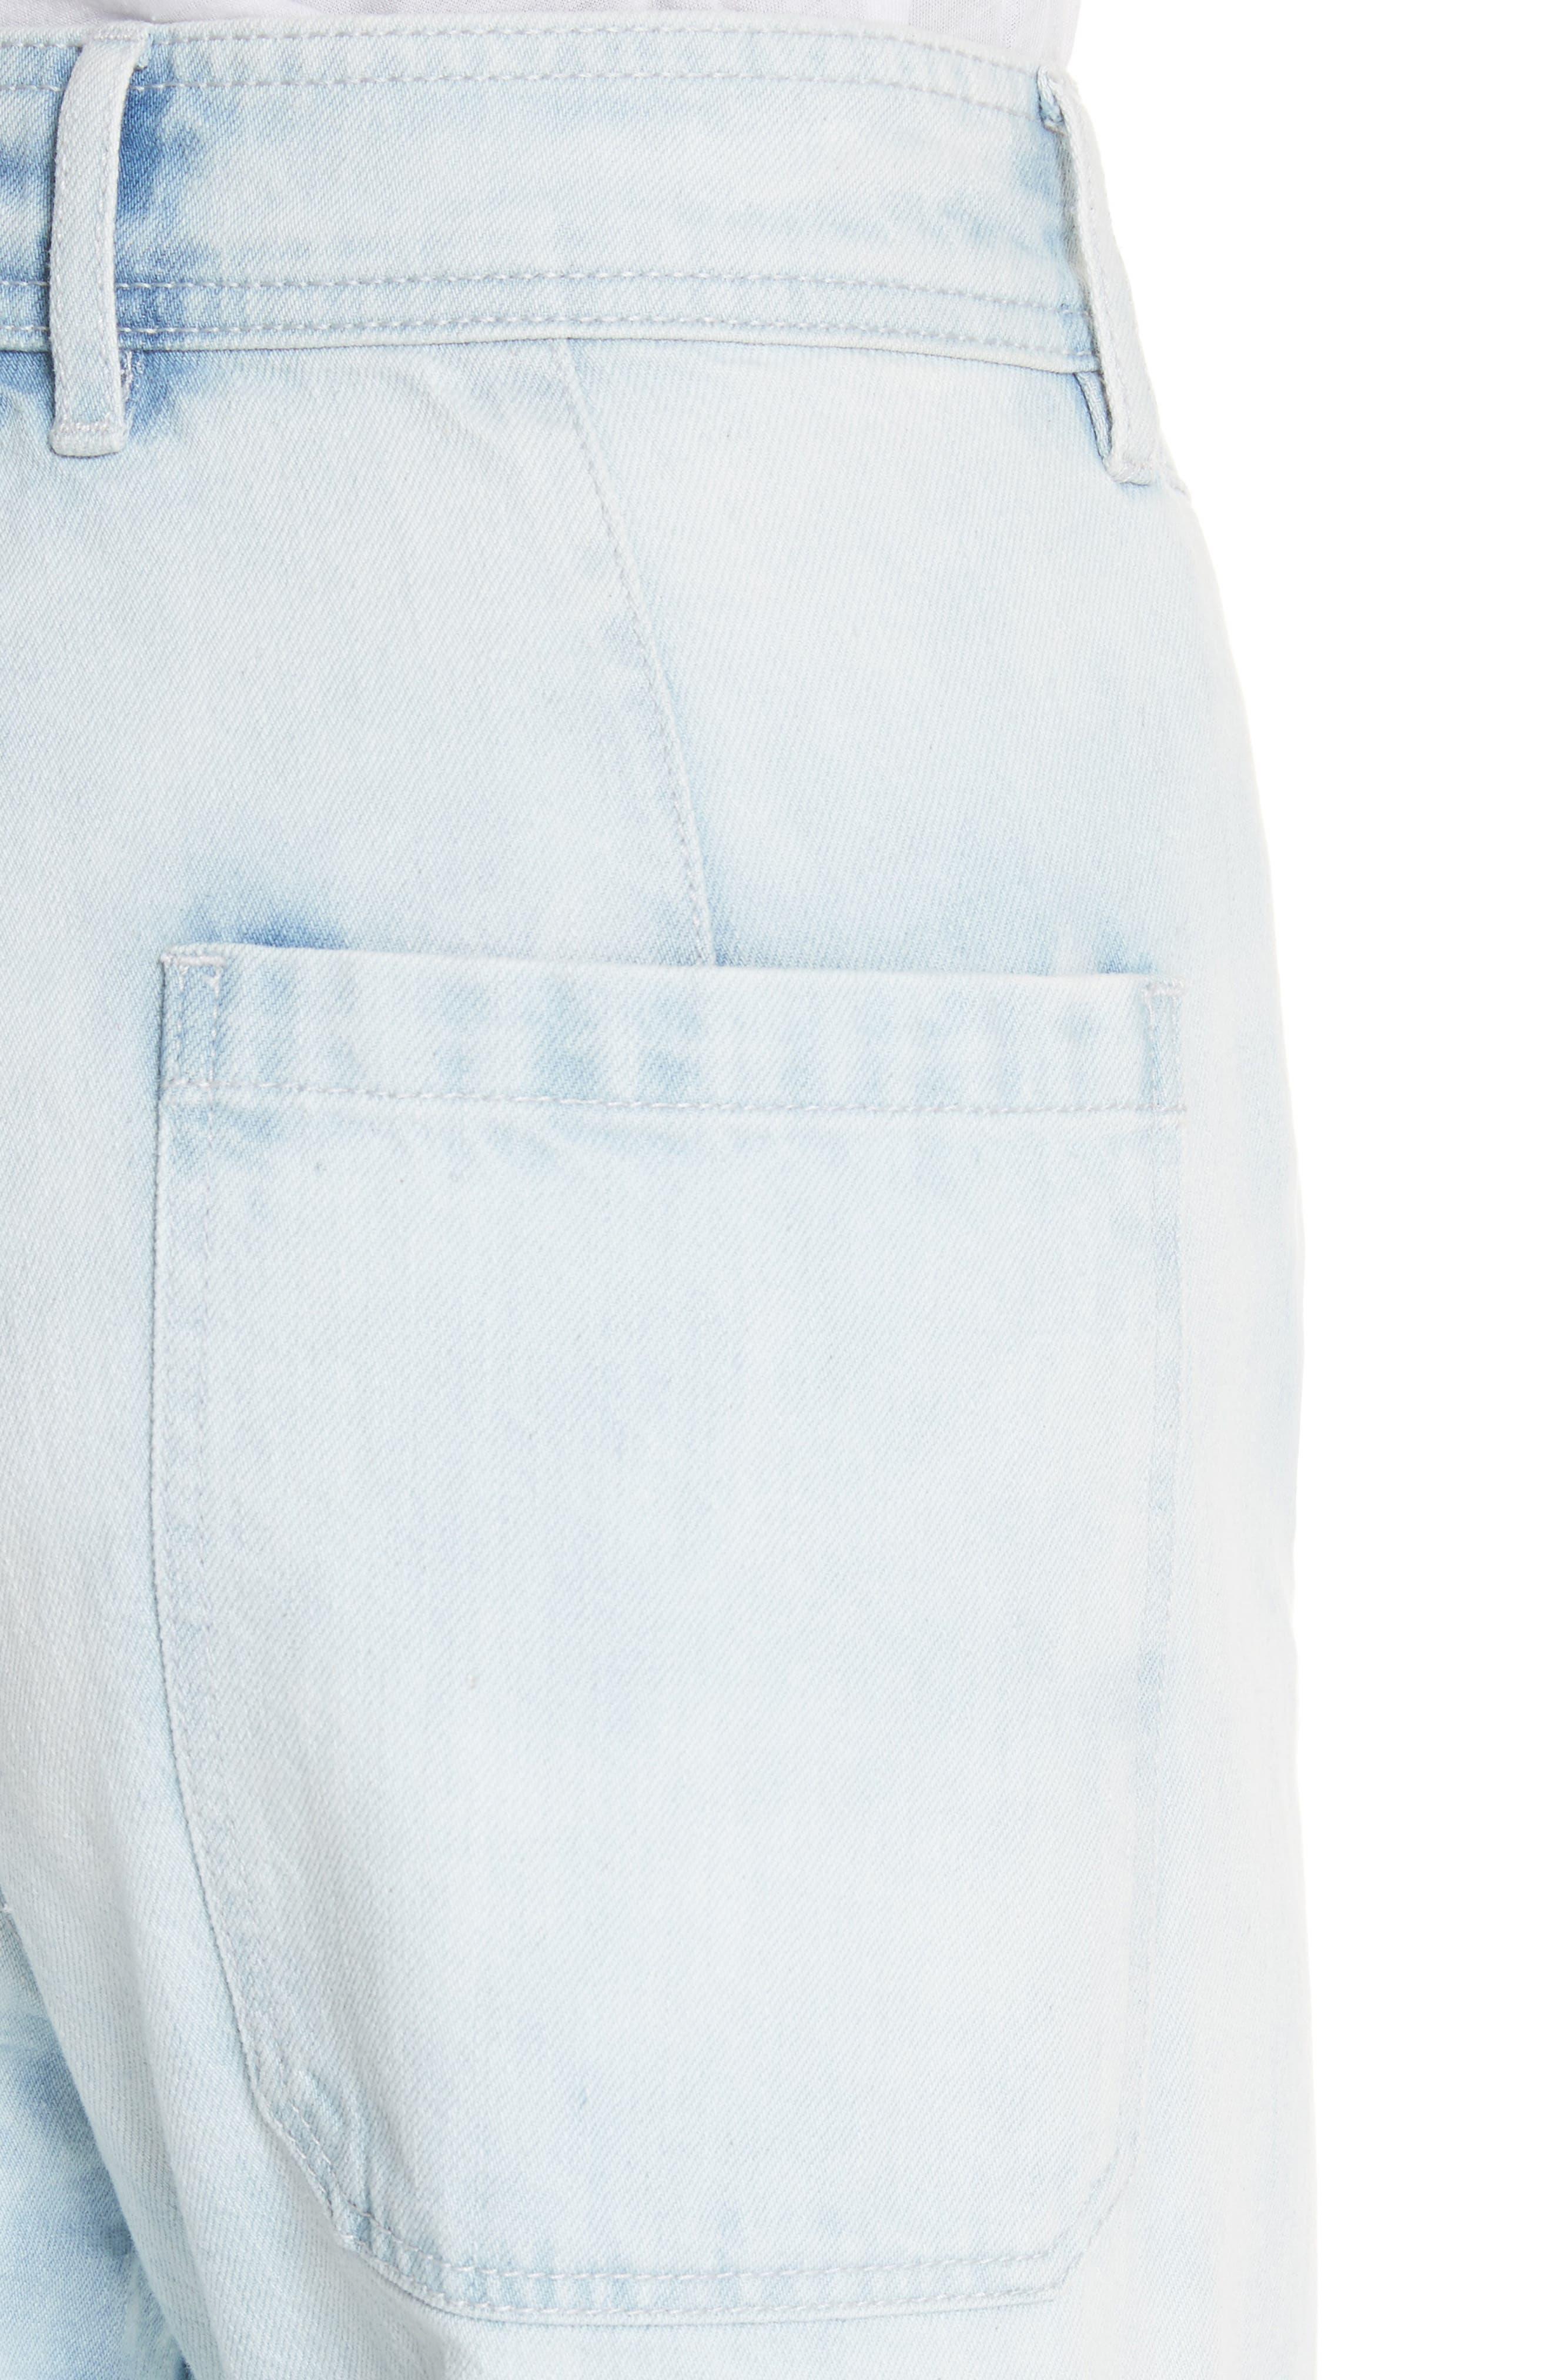 Alternate Image 4  - La Vie Rebecca Taylor Crop Wide Leg Jeans (Nuage Wash)